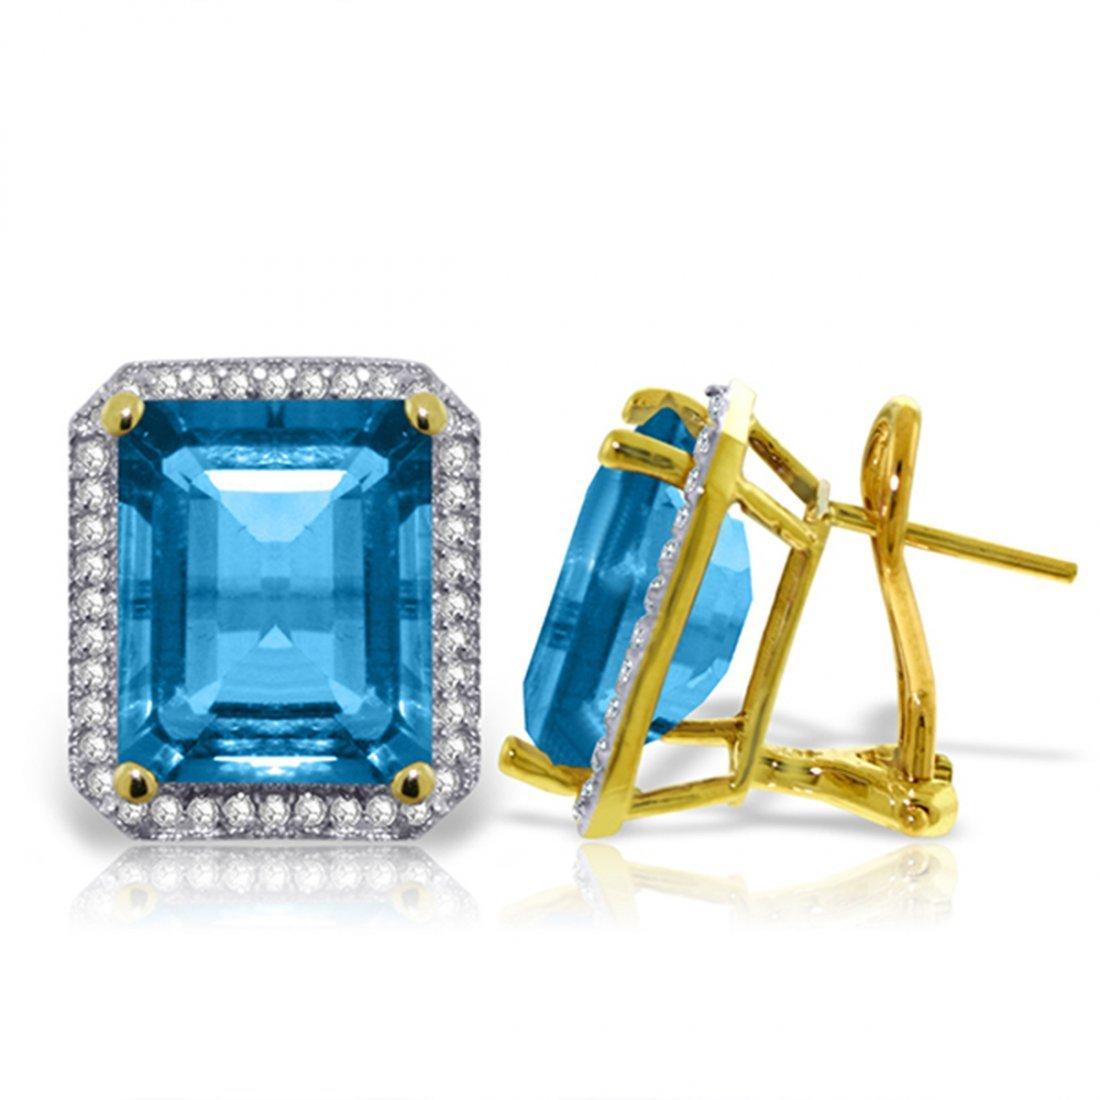 15.6ct 14k Solid  Gold Blue Topaz Diamond Earrings